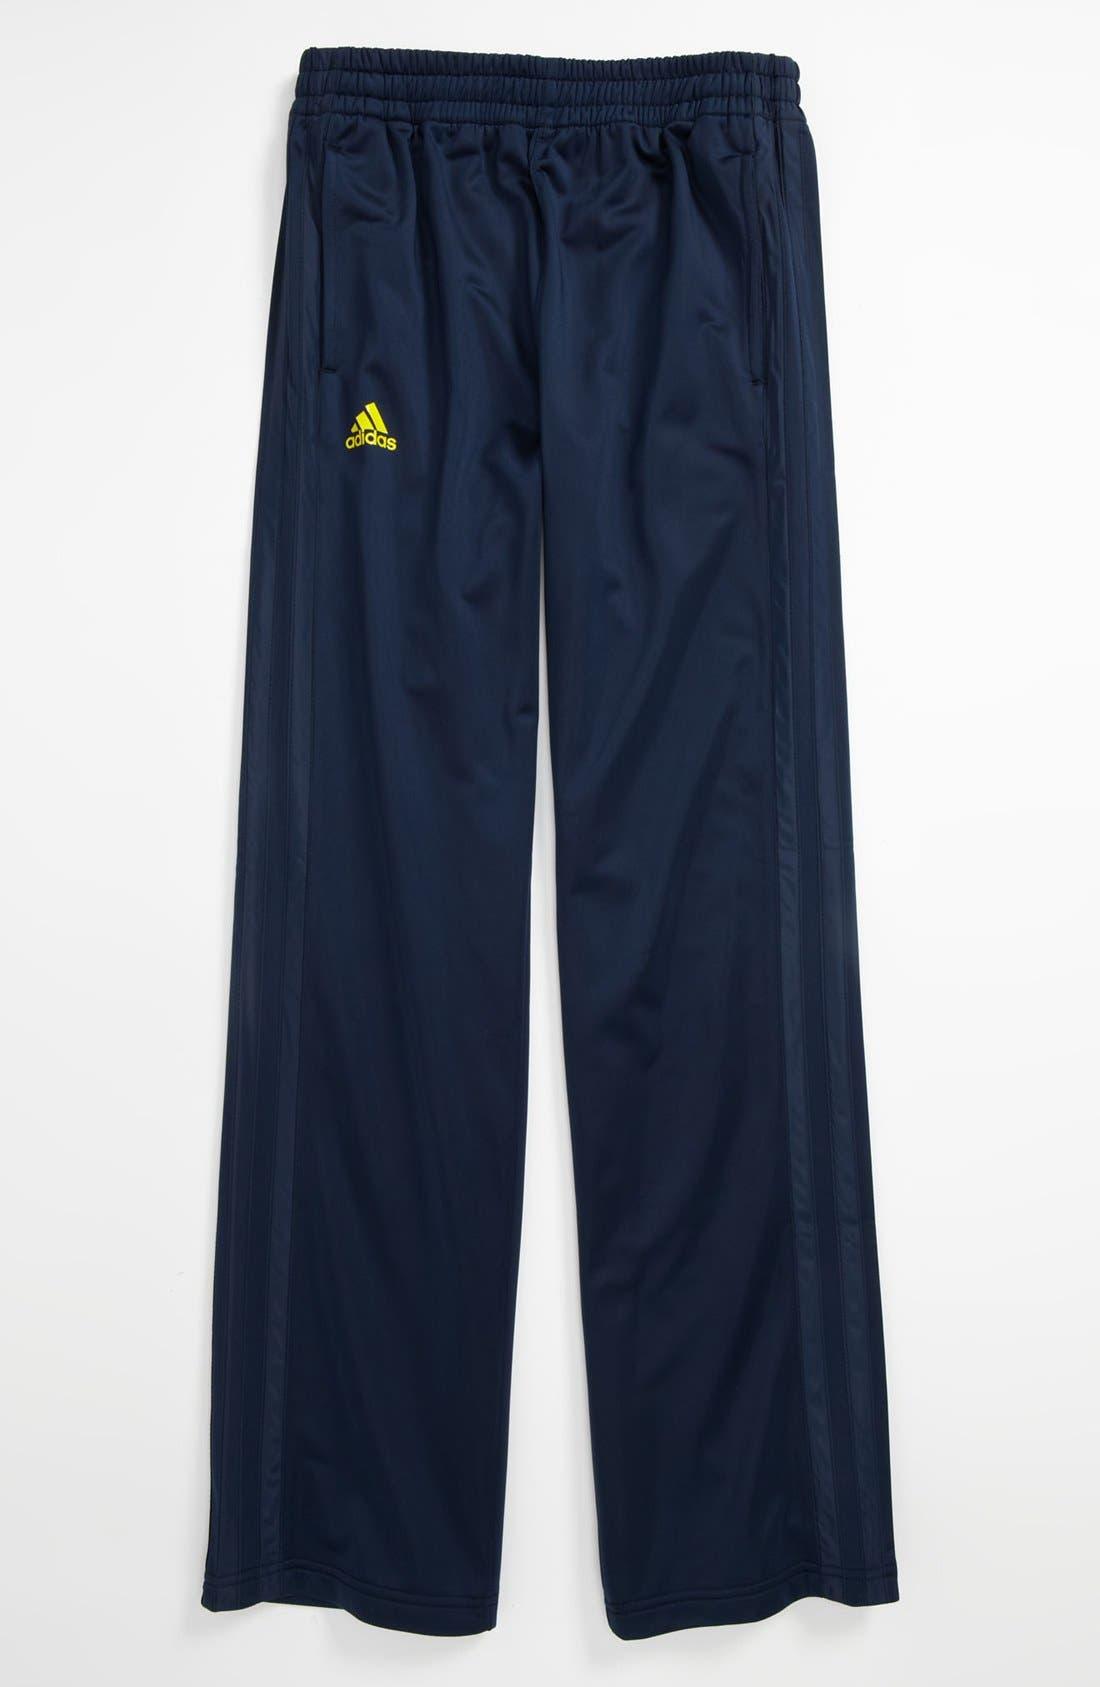 Alternate Image 1 Selected - adidas 'Fat Stripes' Basketball Pants (Big Boys)